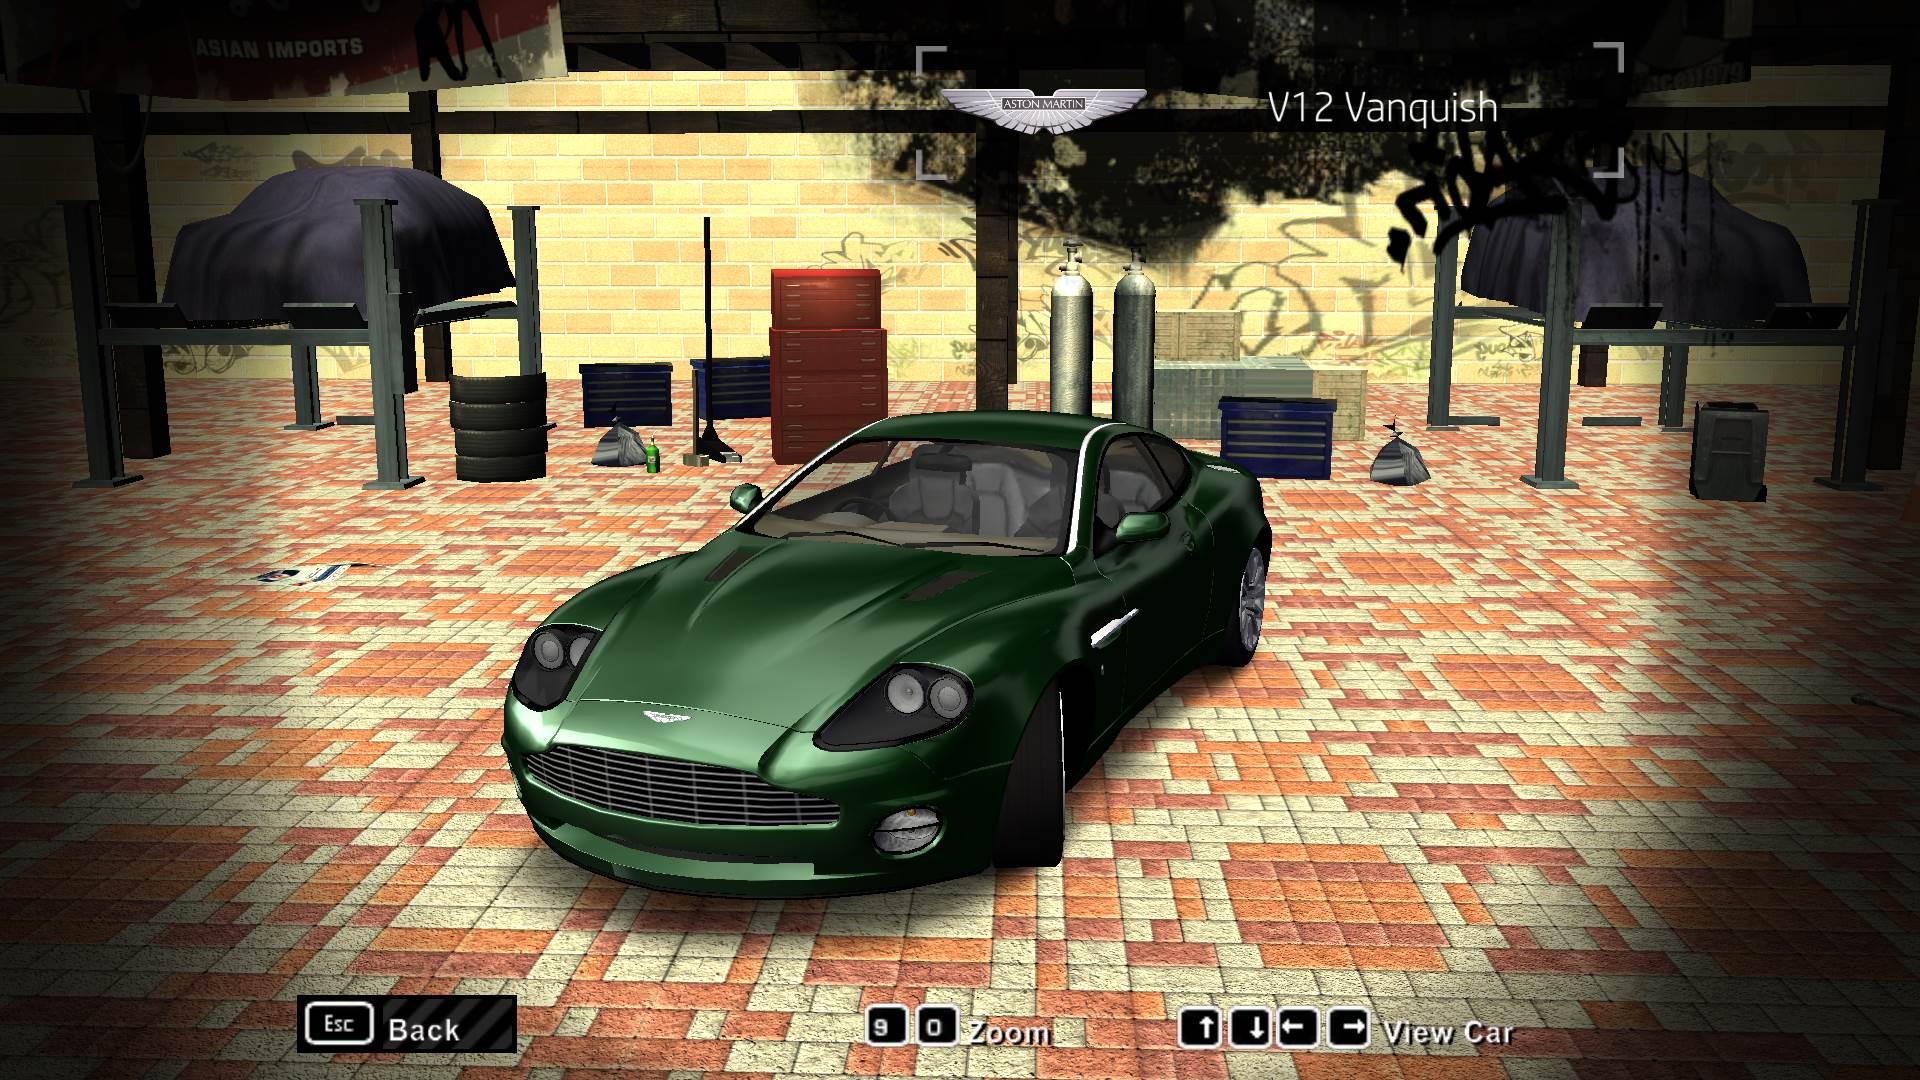 Vanquish2001_NFSMW_1.jpg